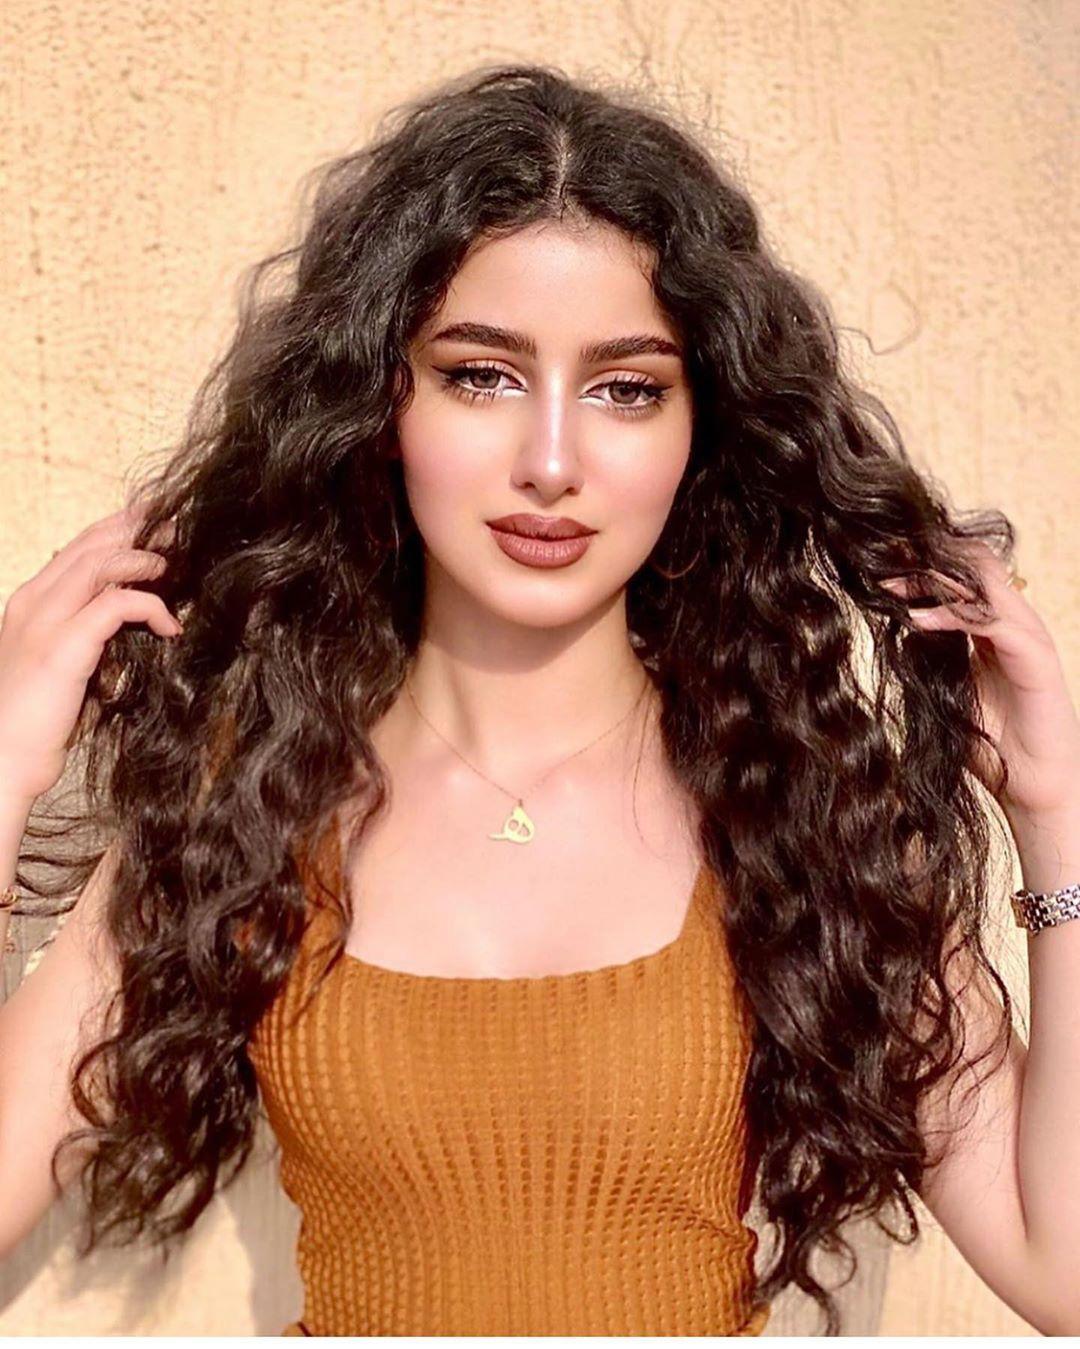 Tumblr Beauty Girl Scarf Hairstyles Beautiful Photo